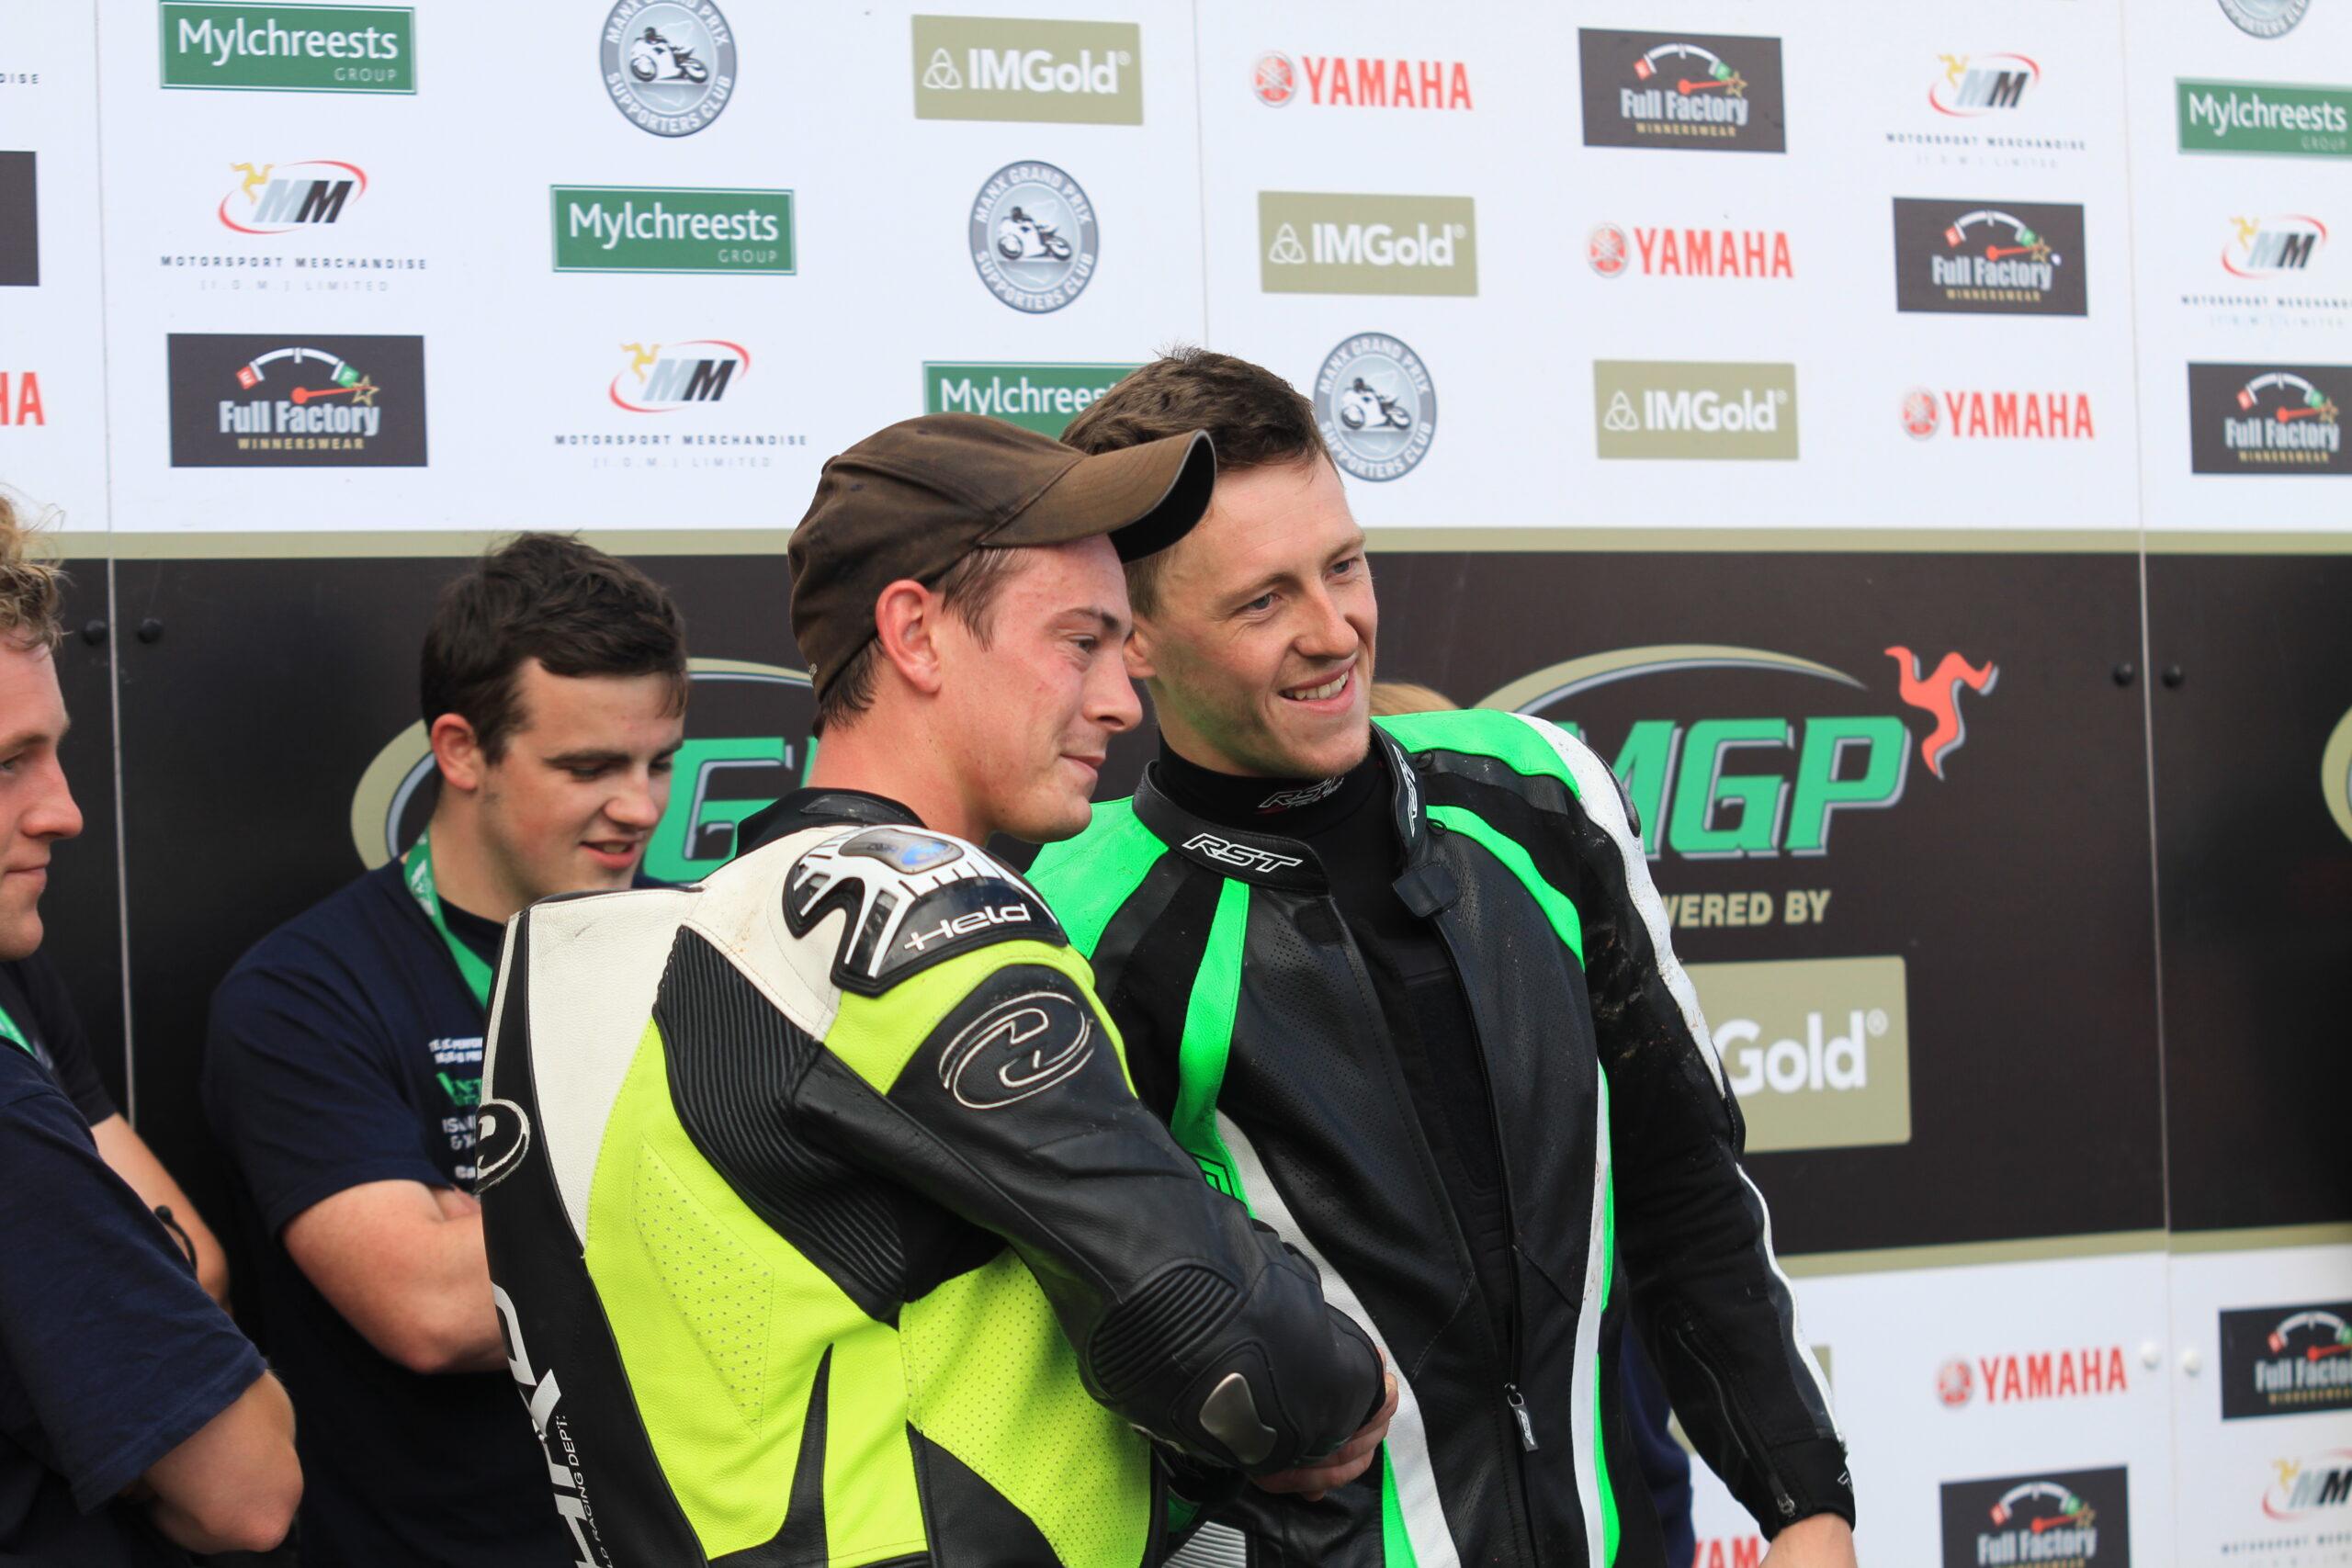 Manx Grand Prix 2016 – A Great Week Of Racing